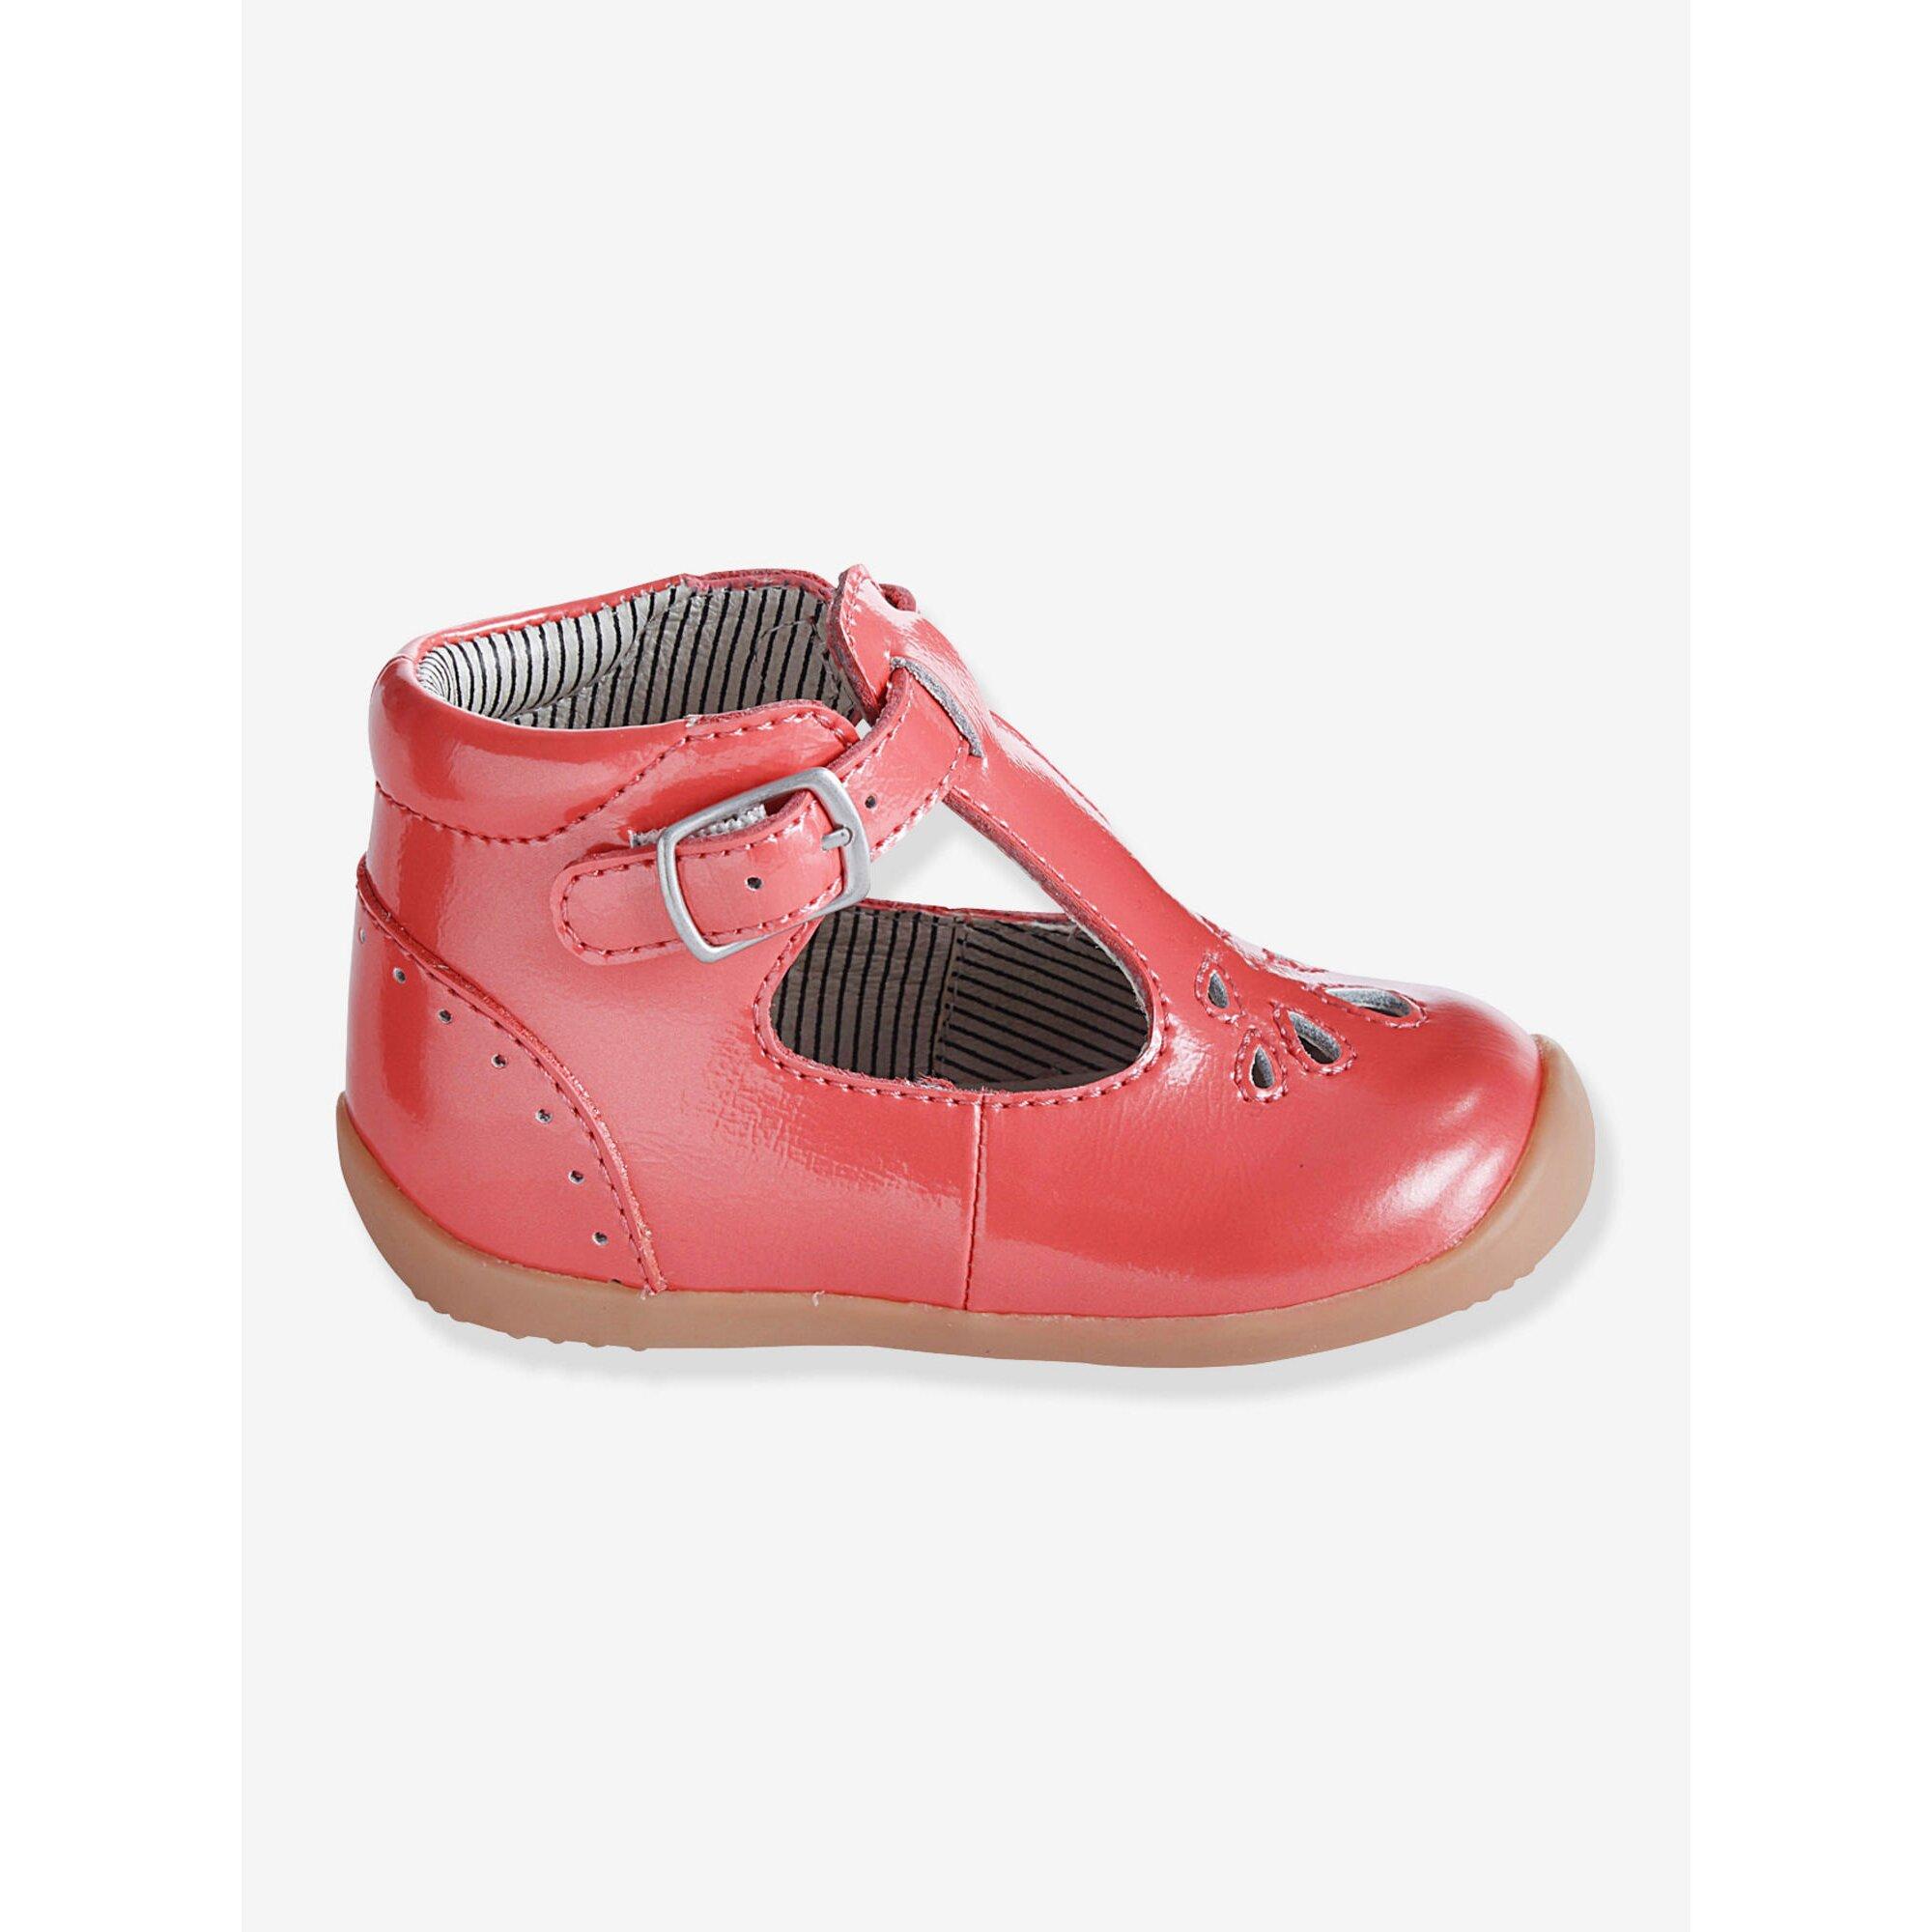 vertbaudet-lauflern-sandalen-fur-madchen, 45.99 EUR @ babywalz-de